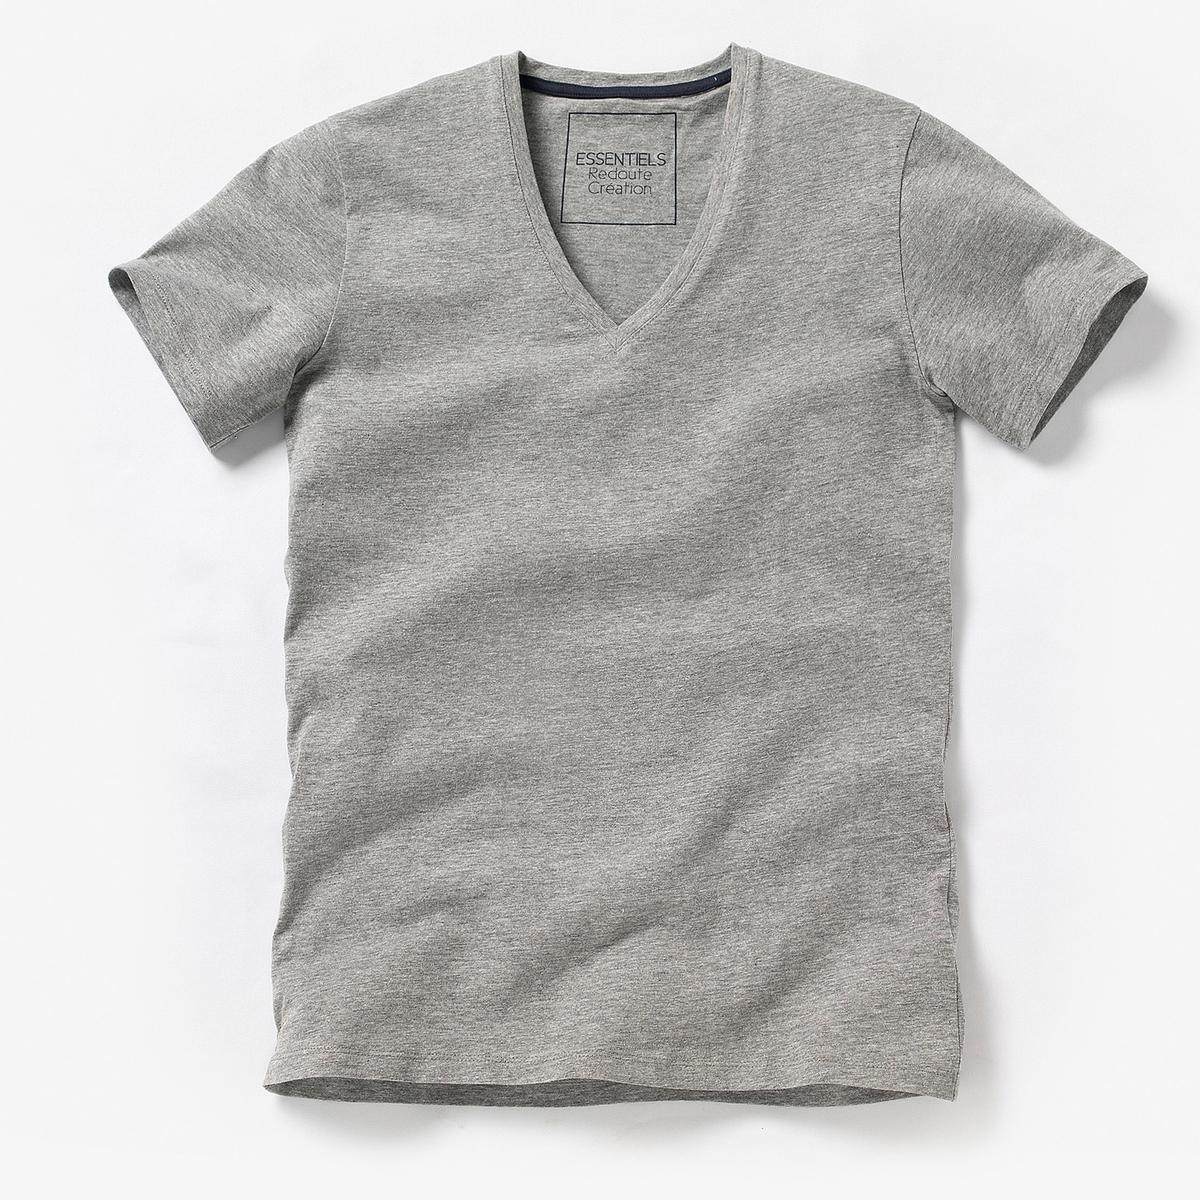 Футболка однотонная с глубоким V-образным вырезом и короткими рукавамиС глубоким V-образным вырезом и короткими рукавами. Джерси, 100% хлопка (серый меланж: 85% хлопка, 15% вискозы). Длина 72 см.<br><br>Цвет: белый,серый меланж,темно-синий,черный,ярко-синий<br>Размер: S.XS.M.XL.XS.M.L.XL.XXL.XS.M.L.XL.XXL.M.L.XL.XXL.4XL.3XL.S.XL.3XL